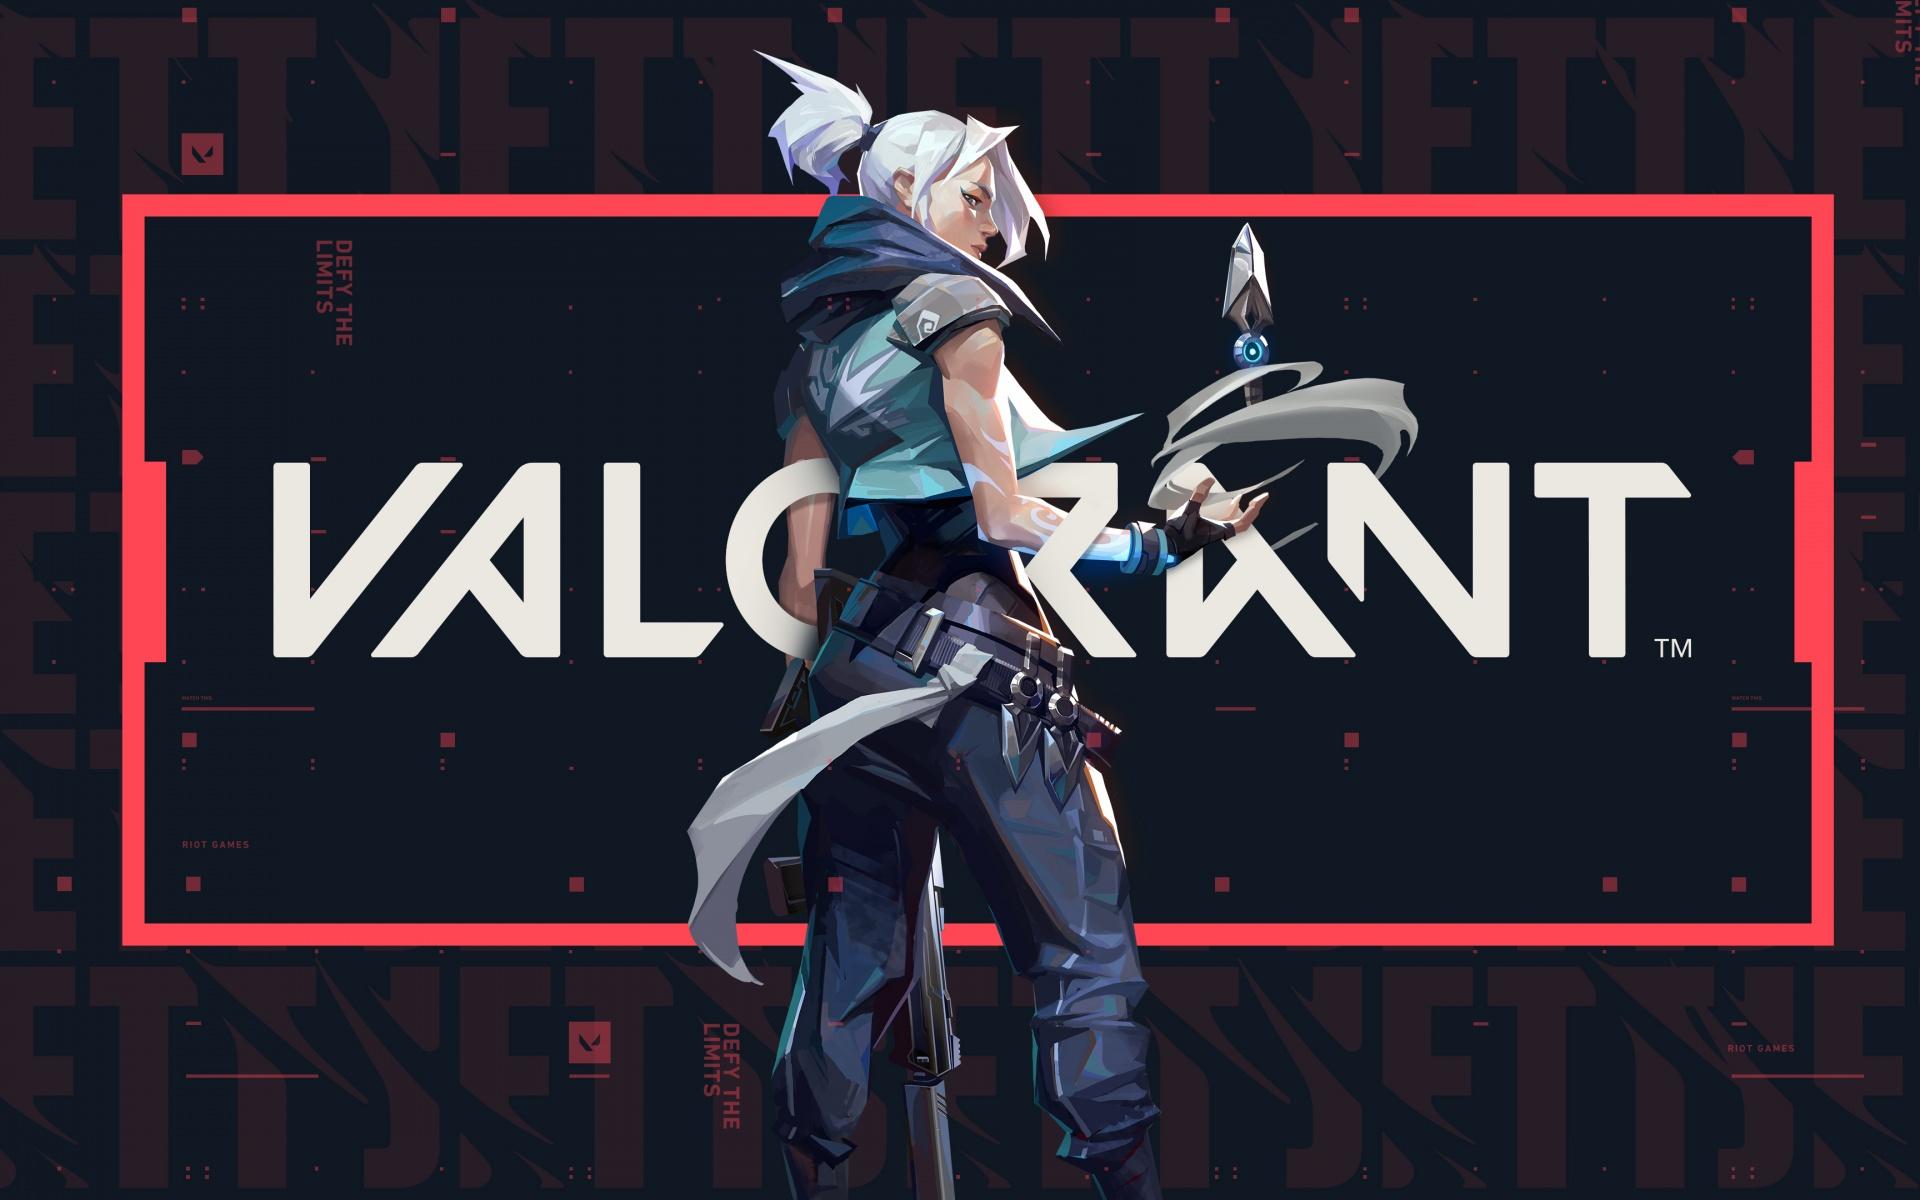 Jett 4k Wallpaper Valorant Pc Games 2020 Games Games 1272